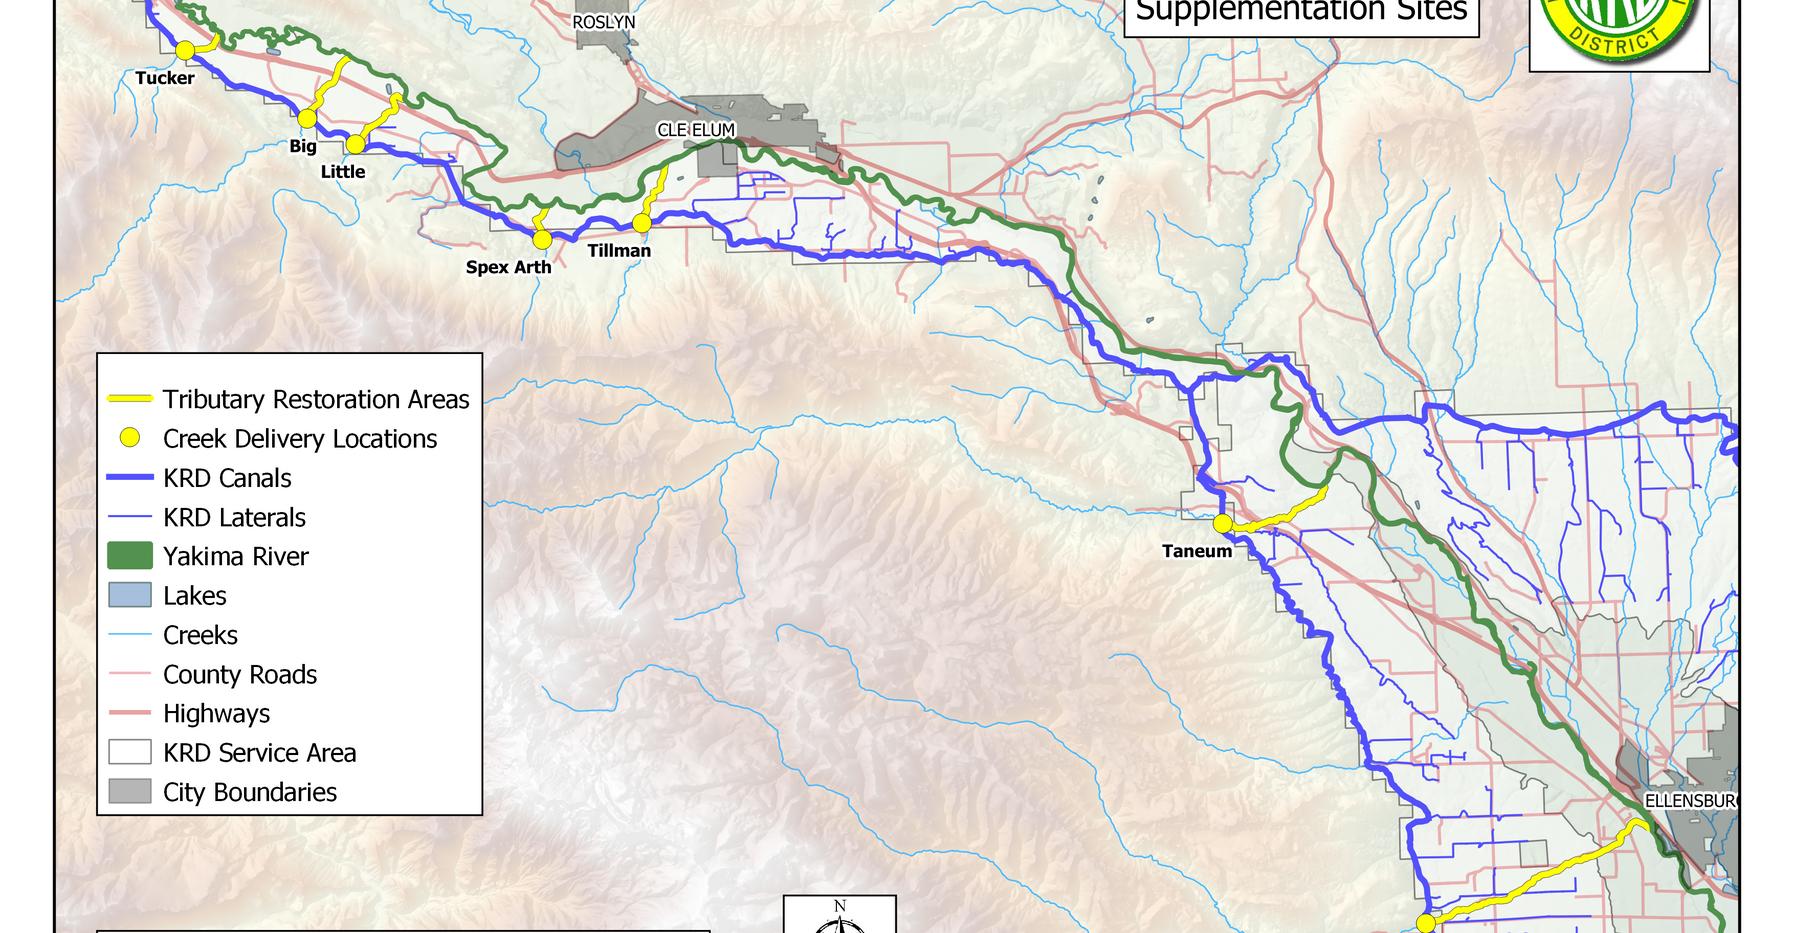 Creek supp sites.png